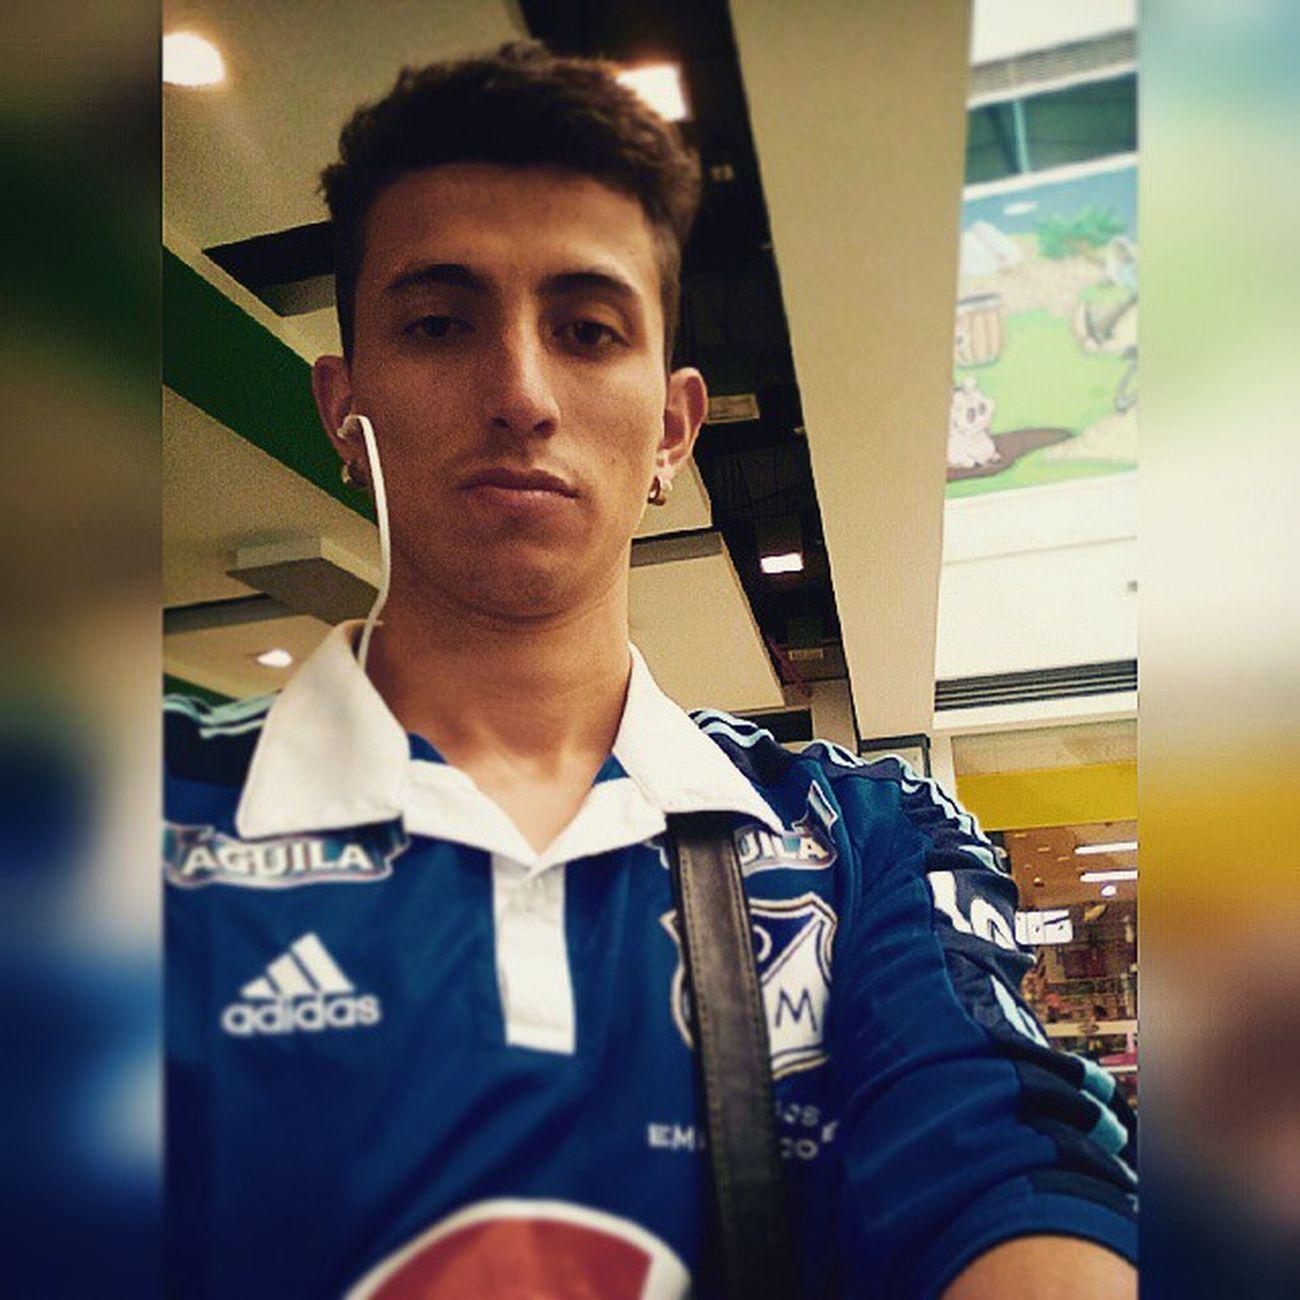 Instashot Nocrop apoyando a mi Embajador Millos Selfie Live Colombia Bogotá Staff Sport Sunday Instapic Feelingblue Bpgthealbum Blue